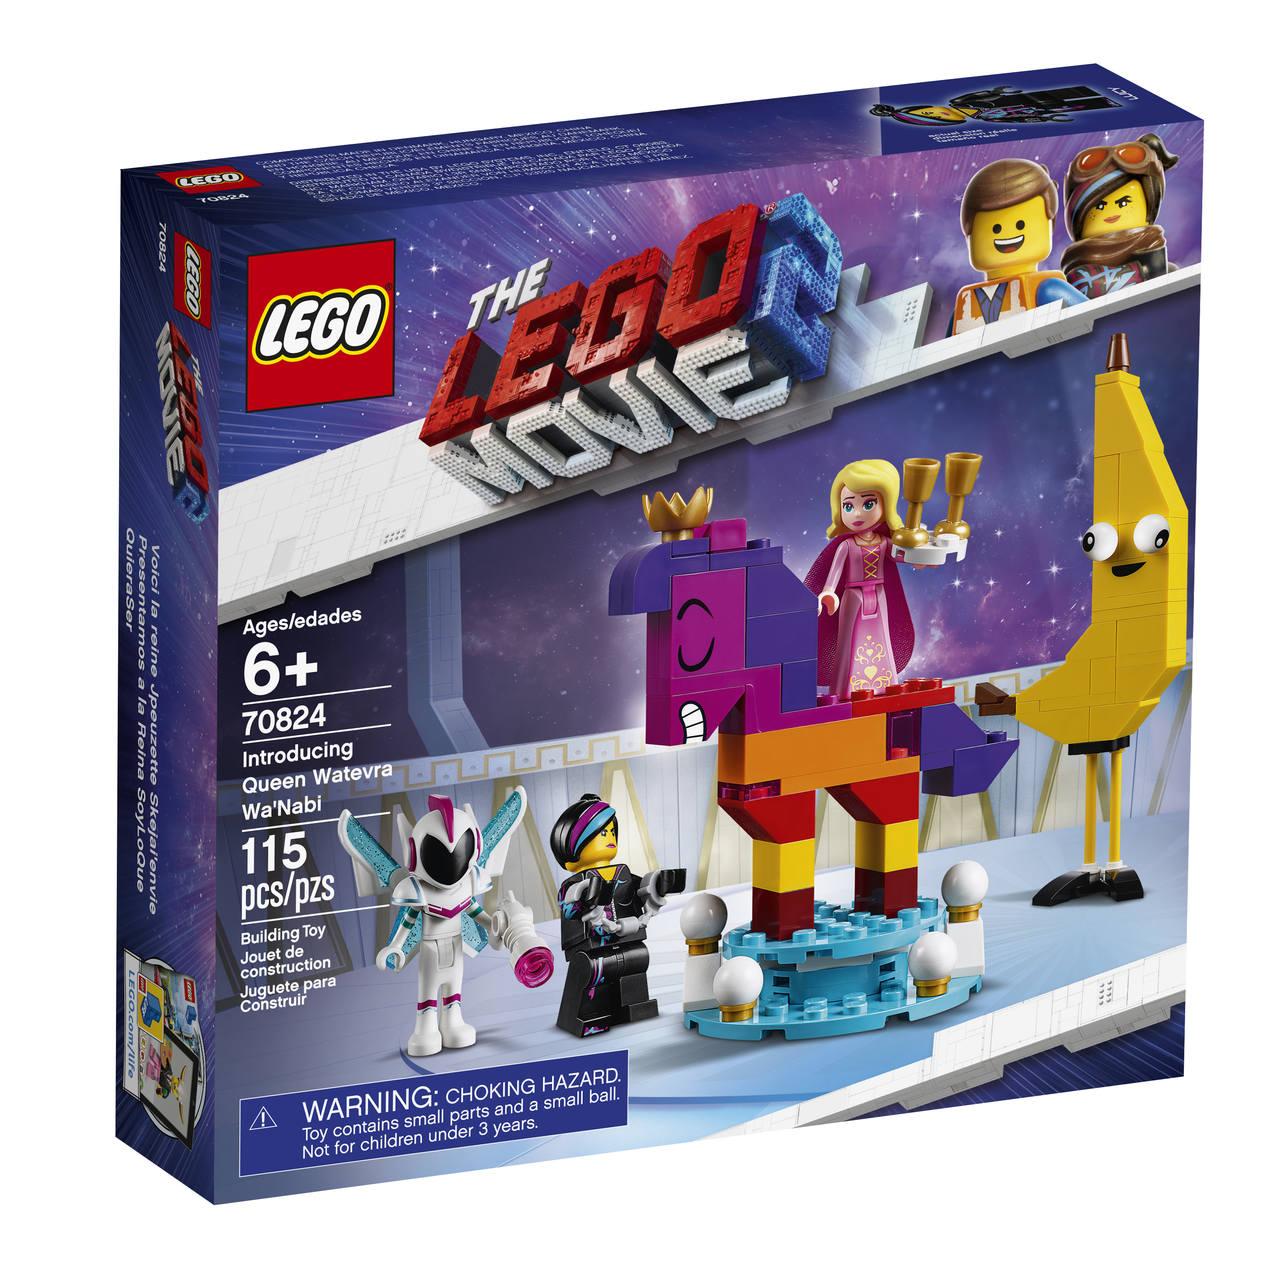 Lego The Movie 2 Apresentando Watevra Wa'nabi A Rainha 70824